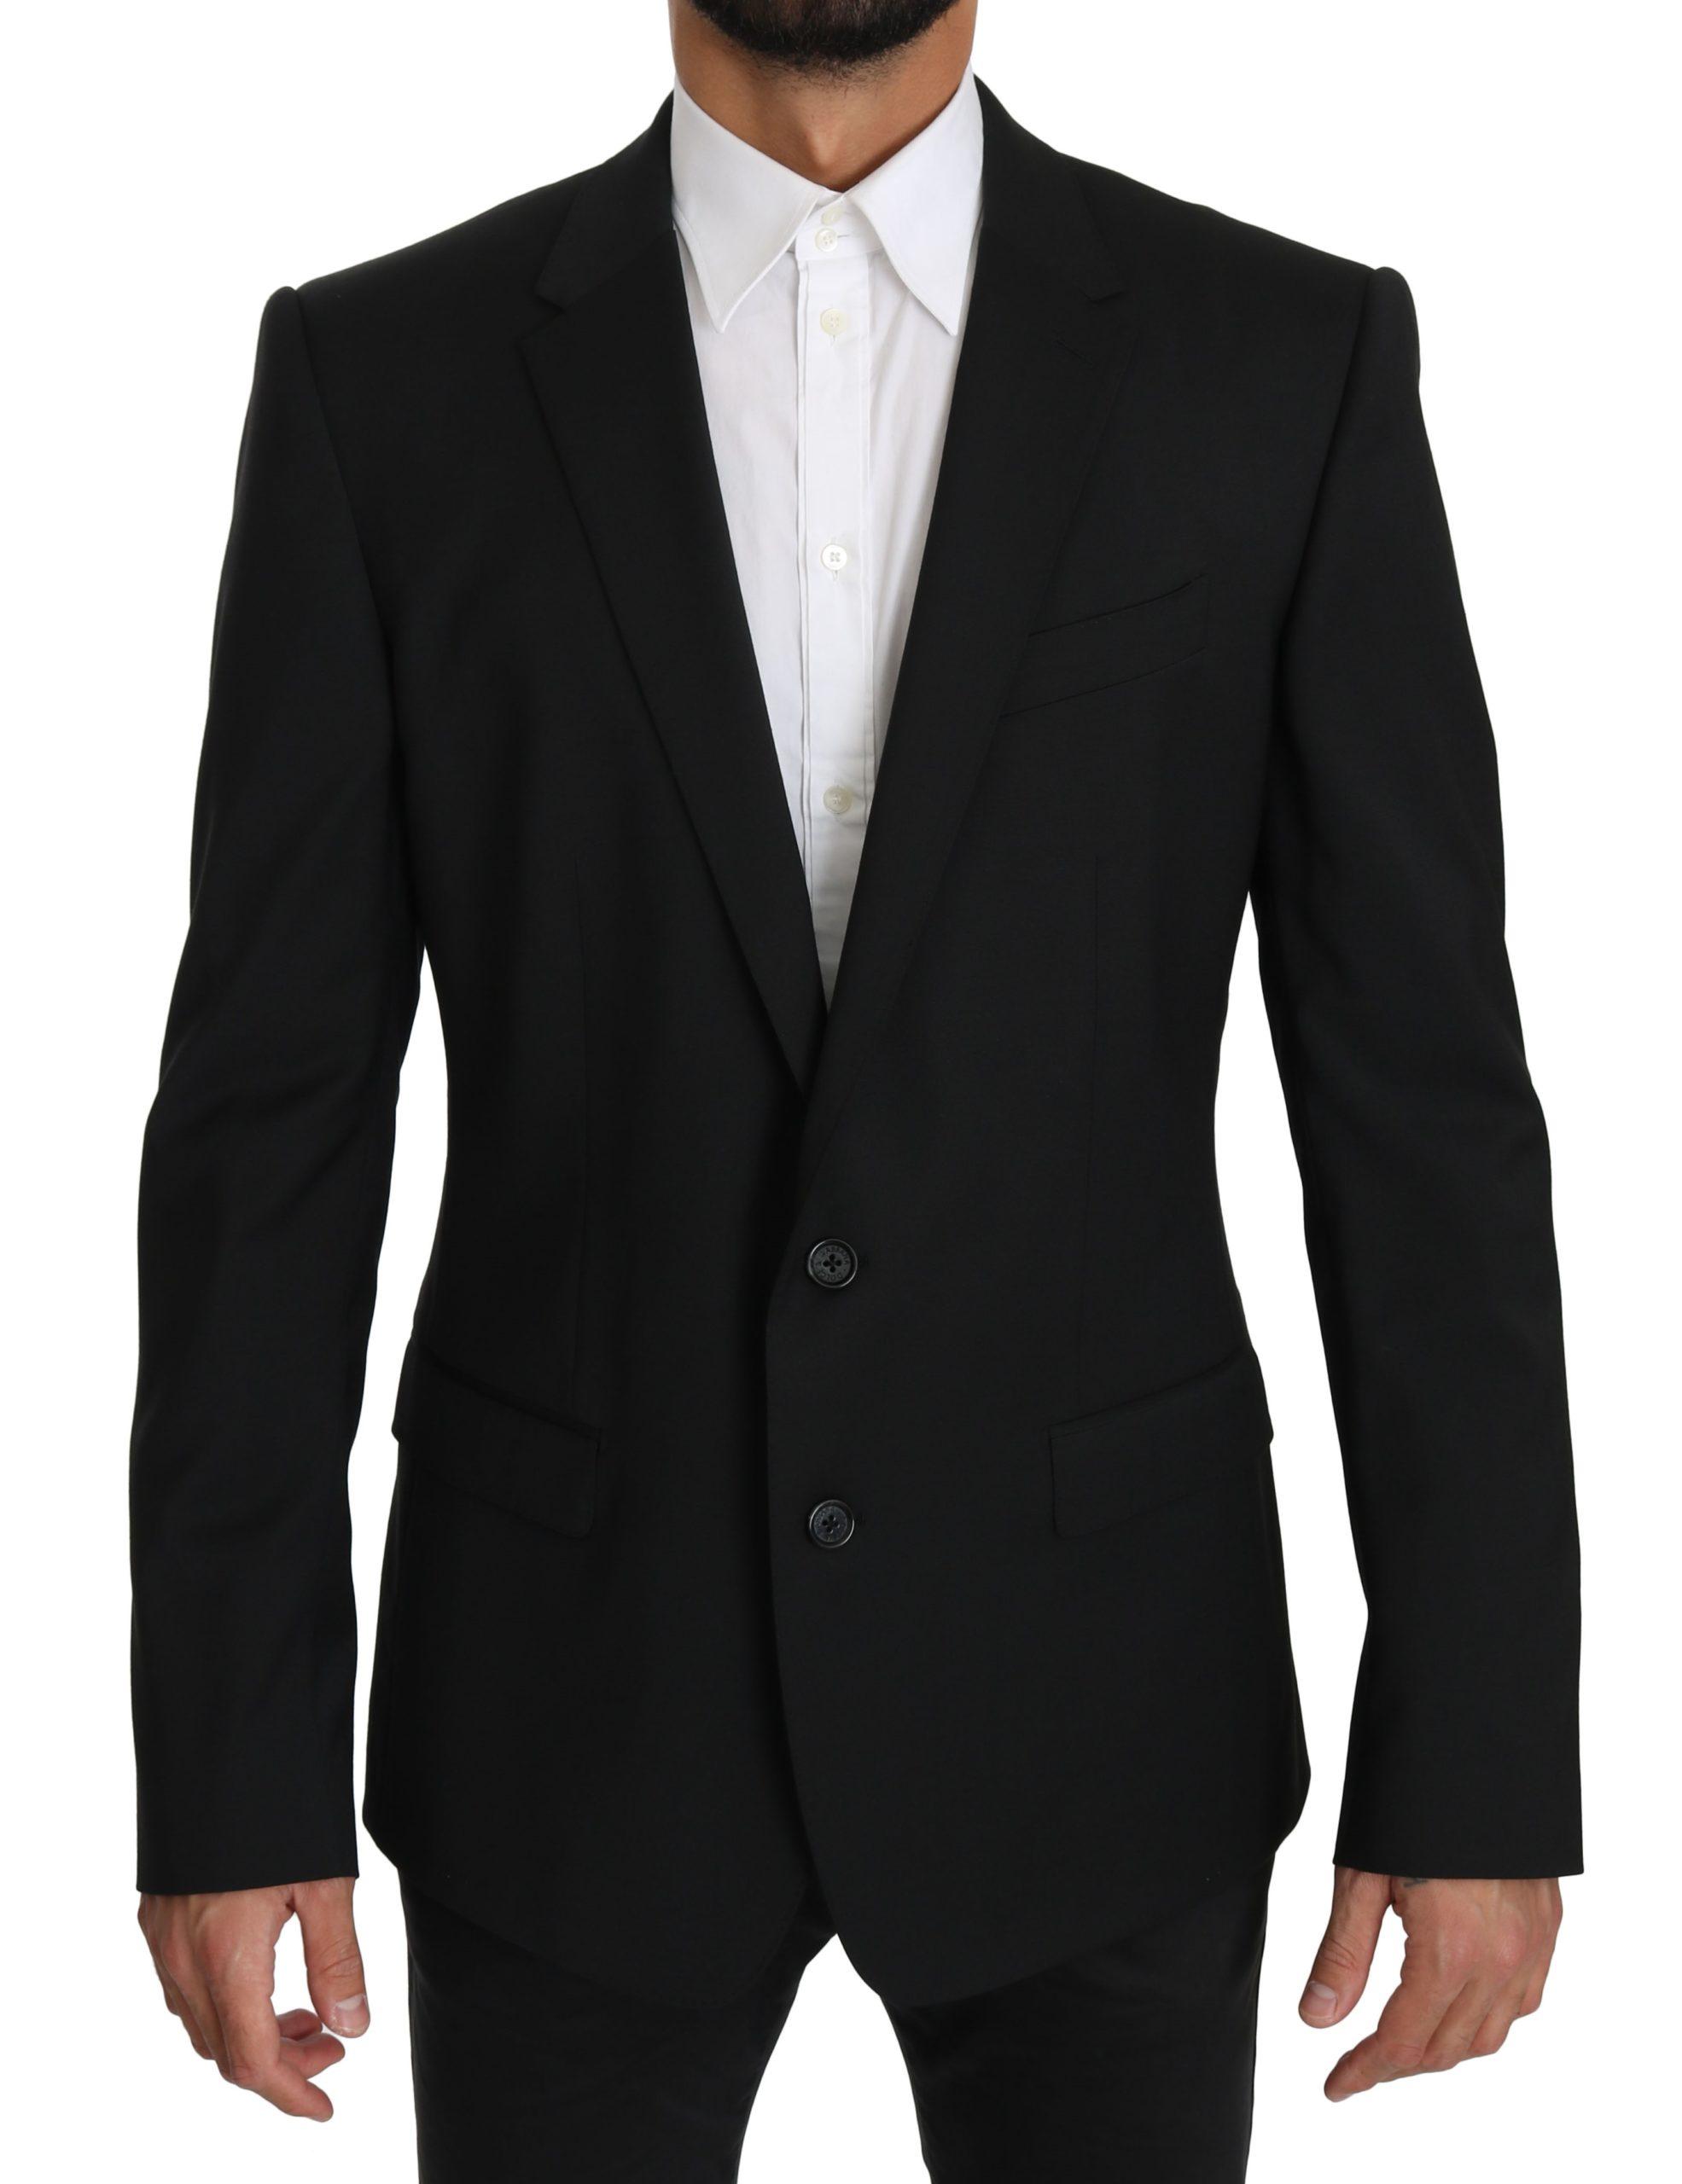 Dolce & Gabbana Men's Single Breasted MARTINI Blazer Black JKT2482 - IT52 | XL